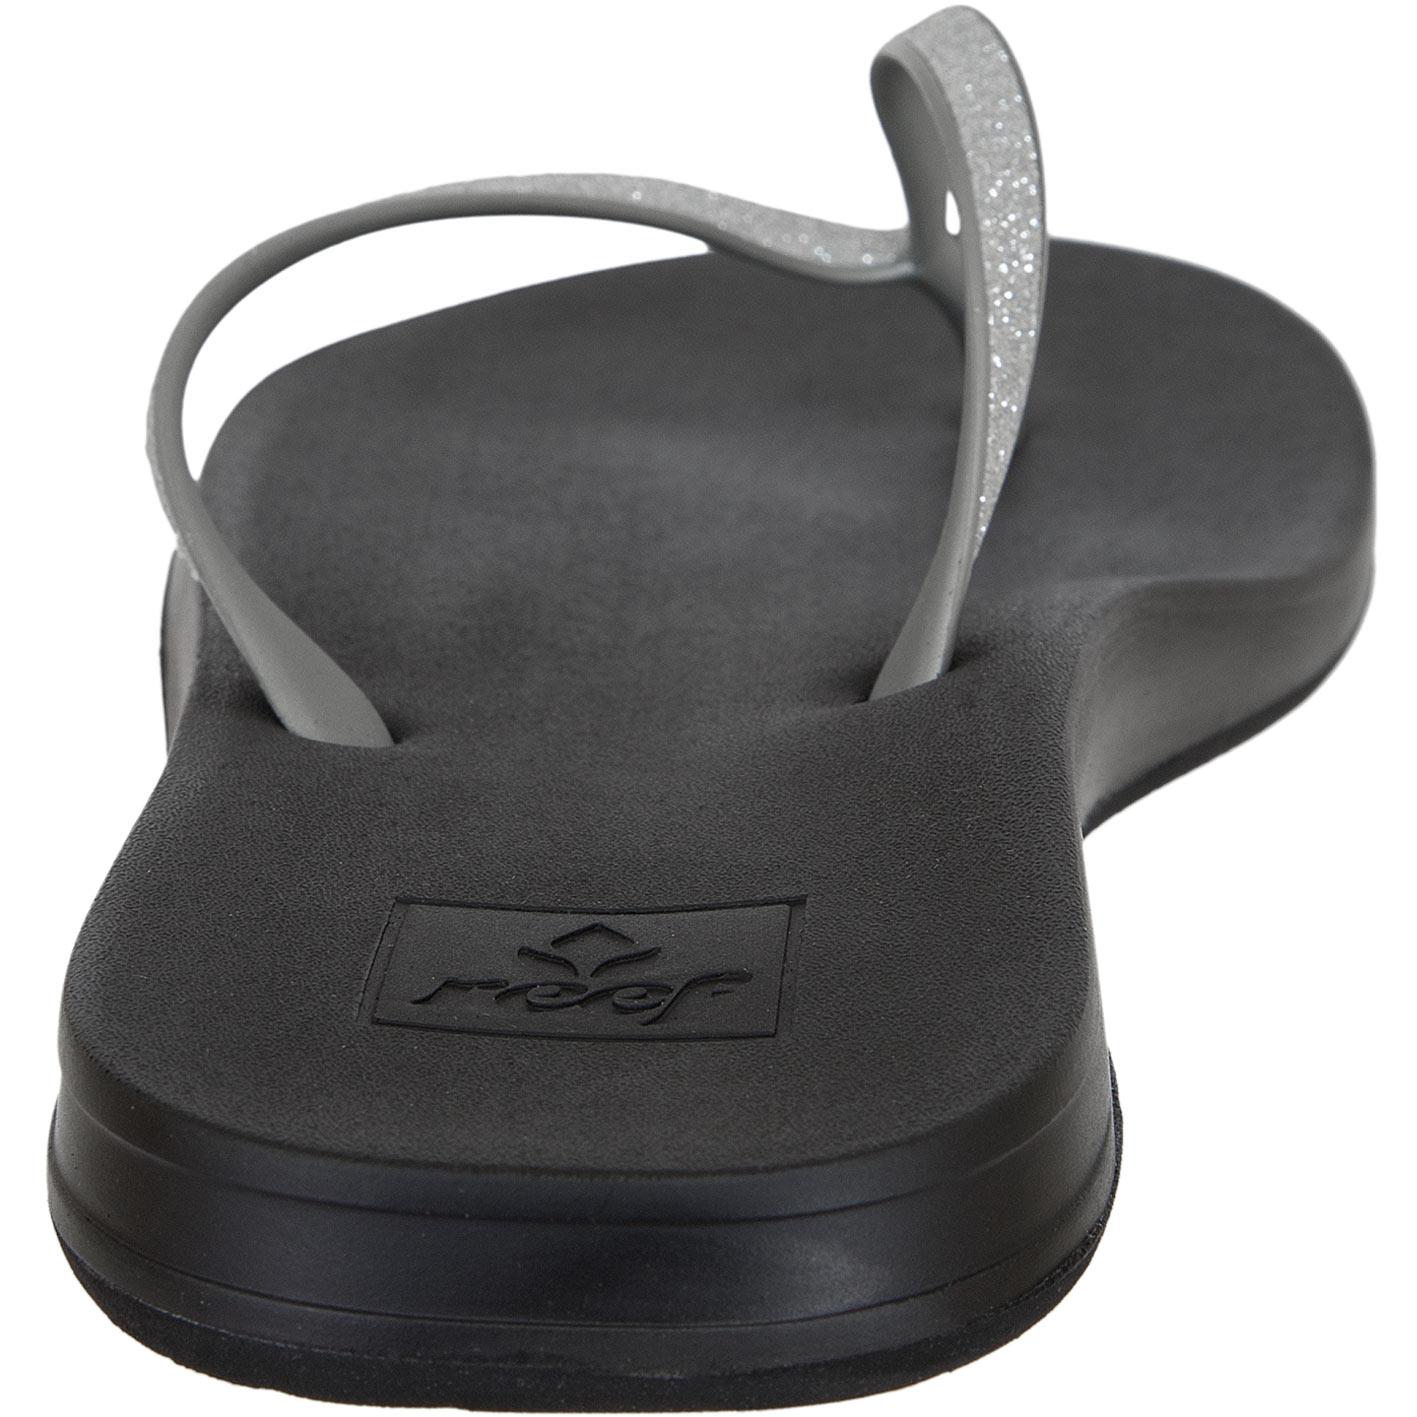 sports shoes 40cf7 5aacc Reef Damen Flip Flop Cushion Bounce Stargazer silver